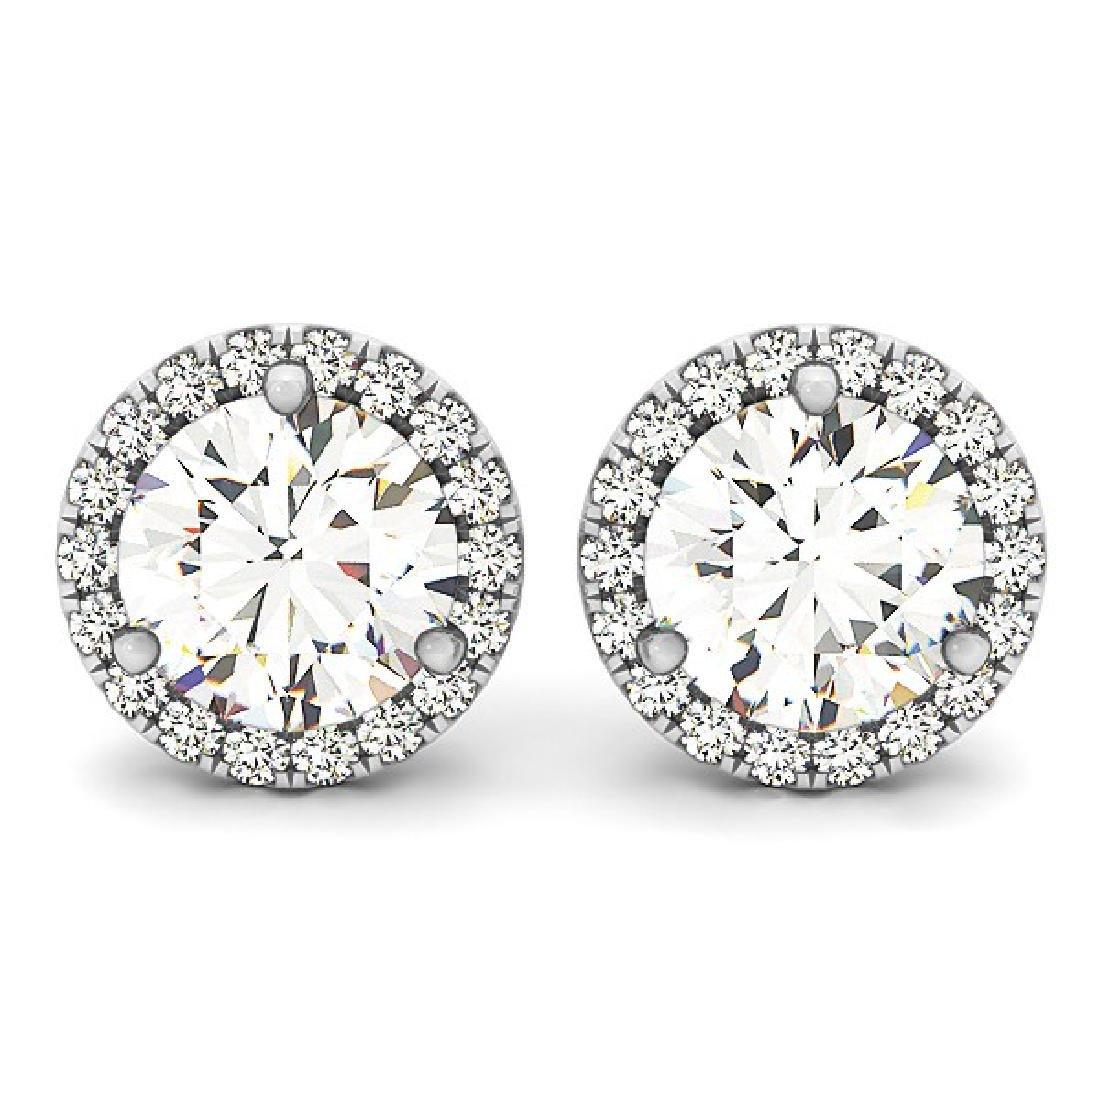 2.75 CTW Diamond Solitaire Earrings VS/SI Certified 14K - 2